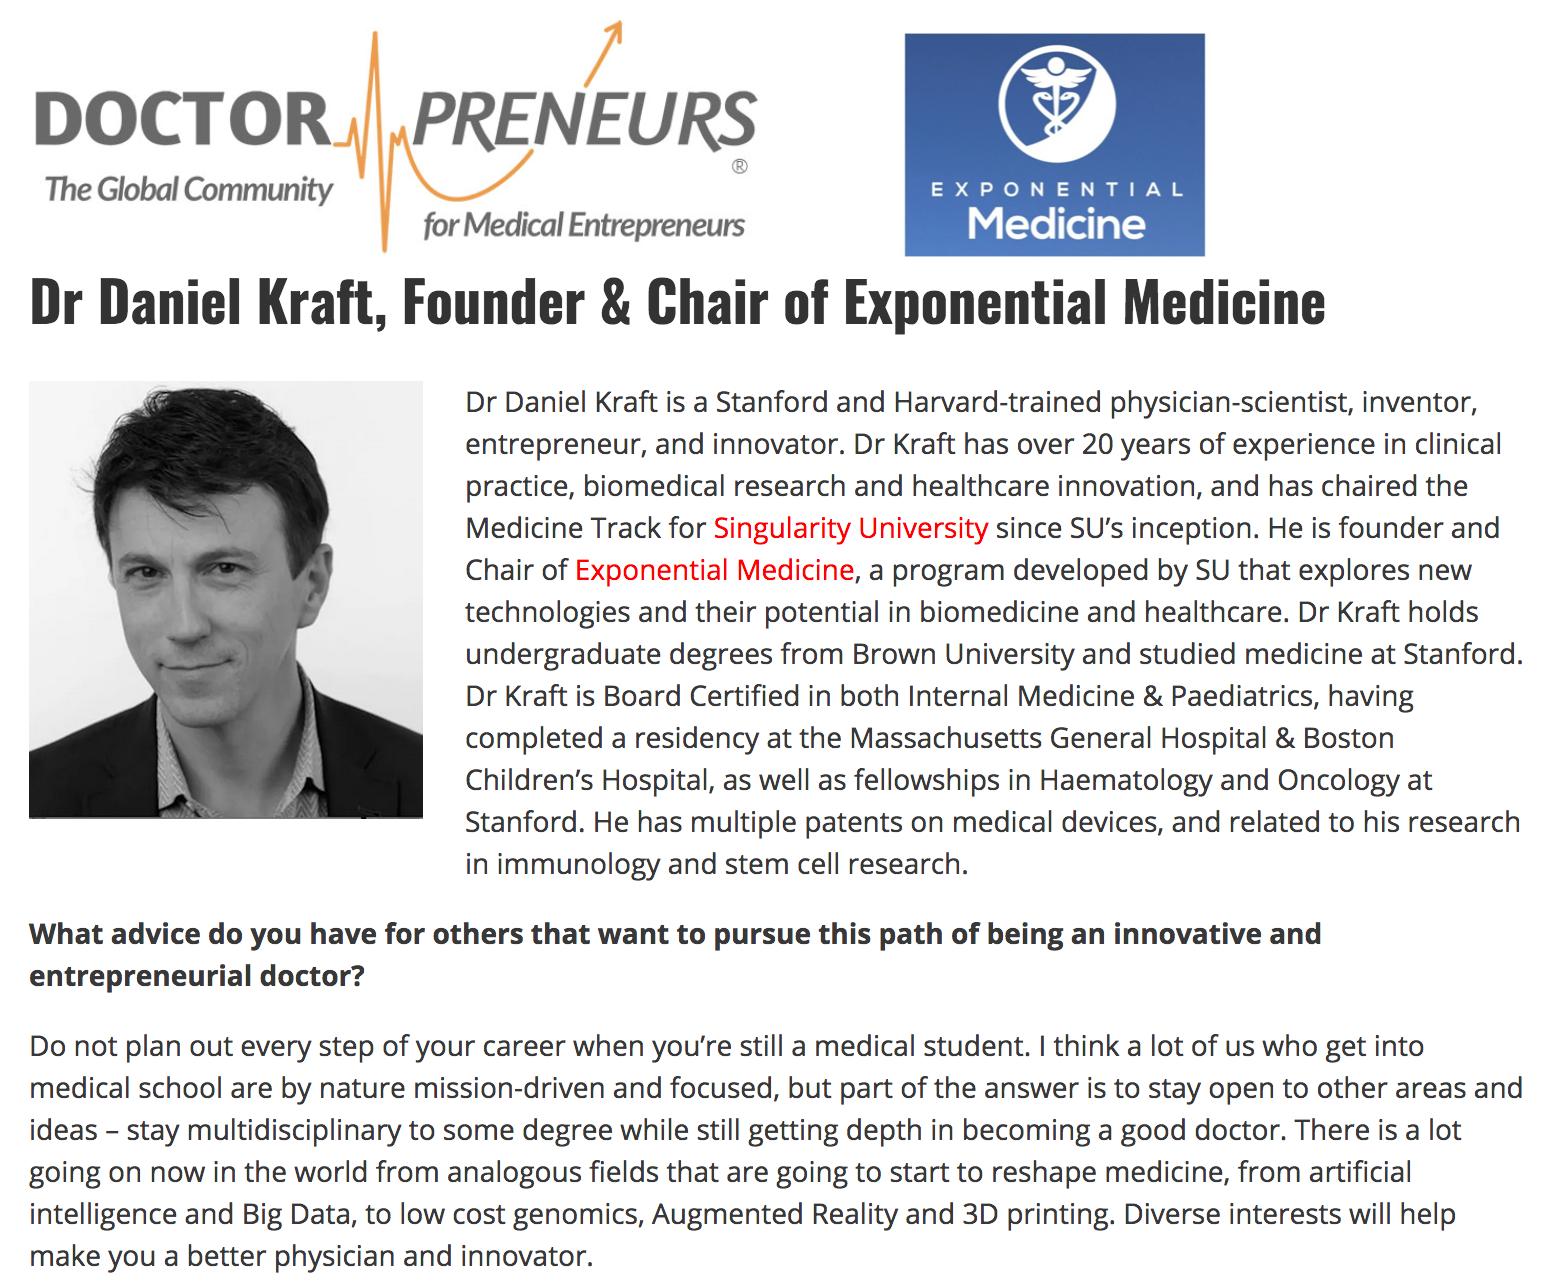 Doctorpreneurs: Daniel Kraft on Innovation and Exponential Medicine